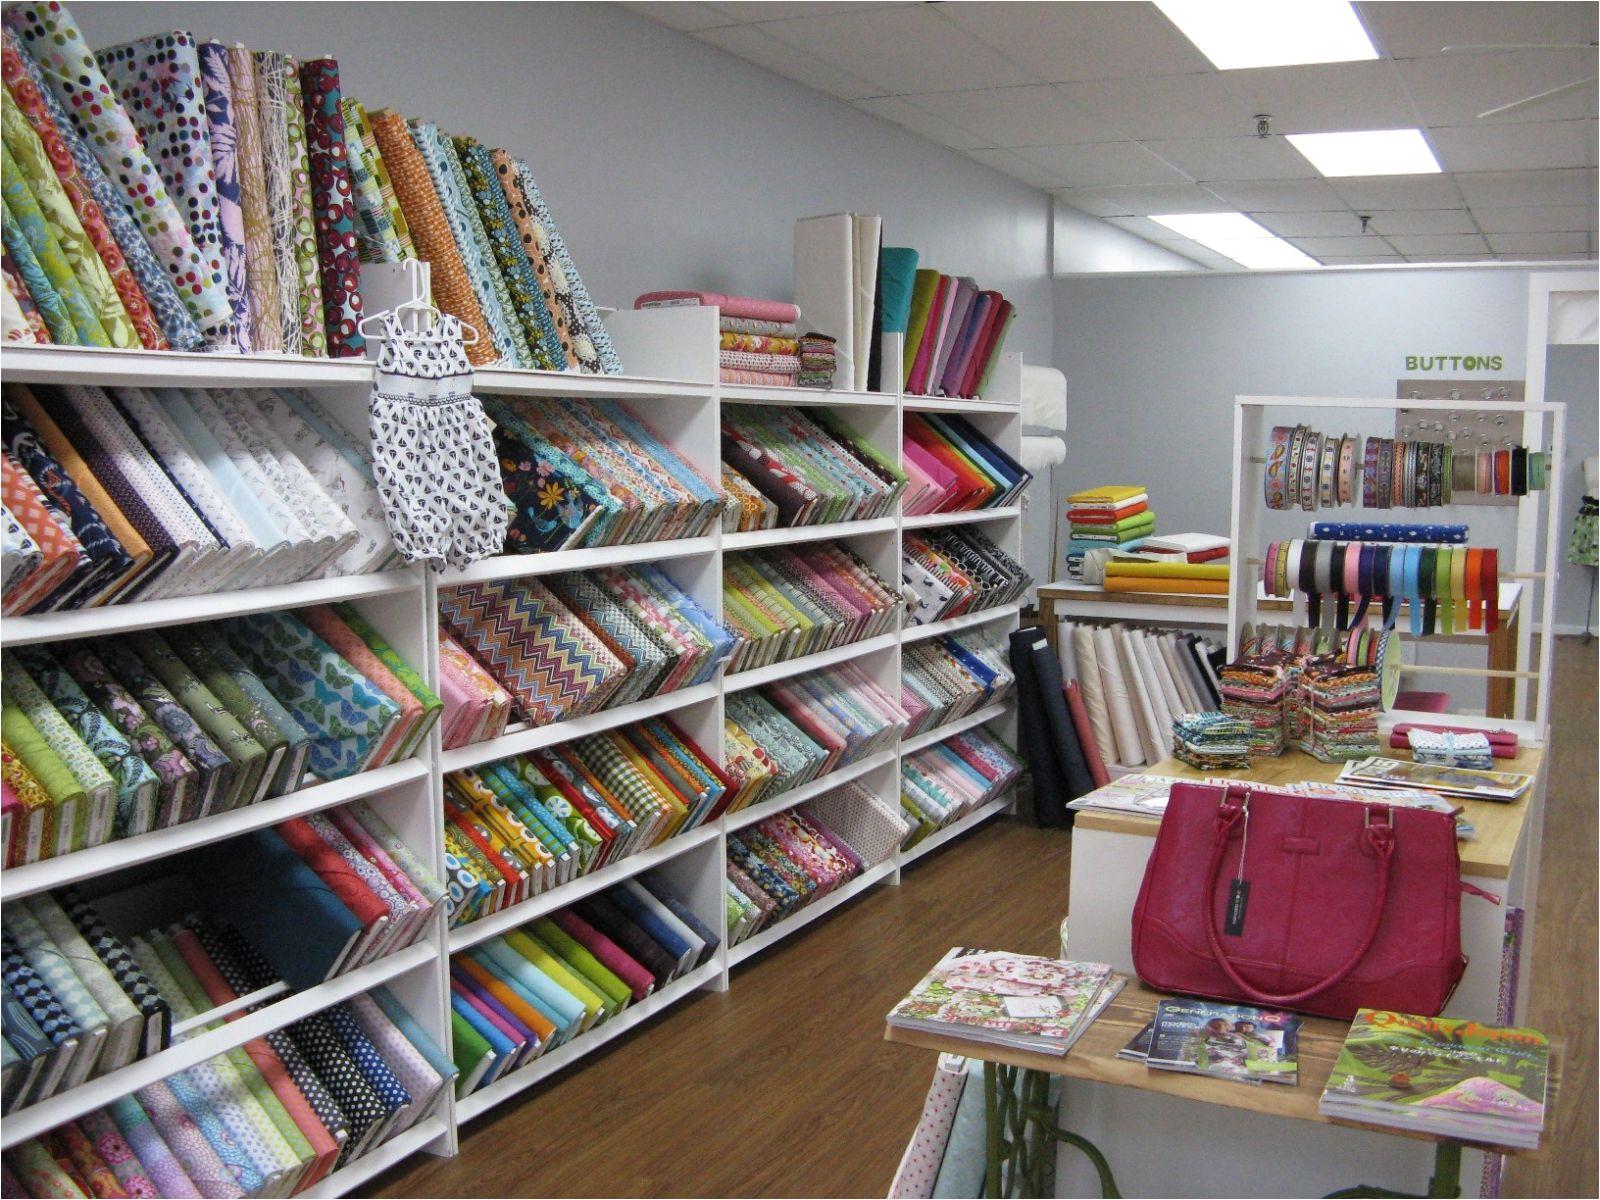 Clothing Fabric Stores Myrtle Beach Sc Head Shop Kansas City HTML In Wovynivugo Github Com source Code